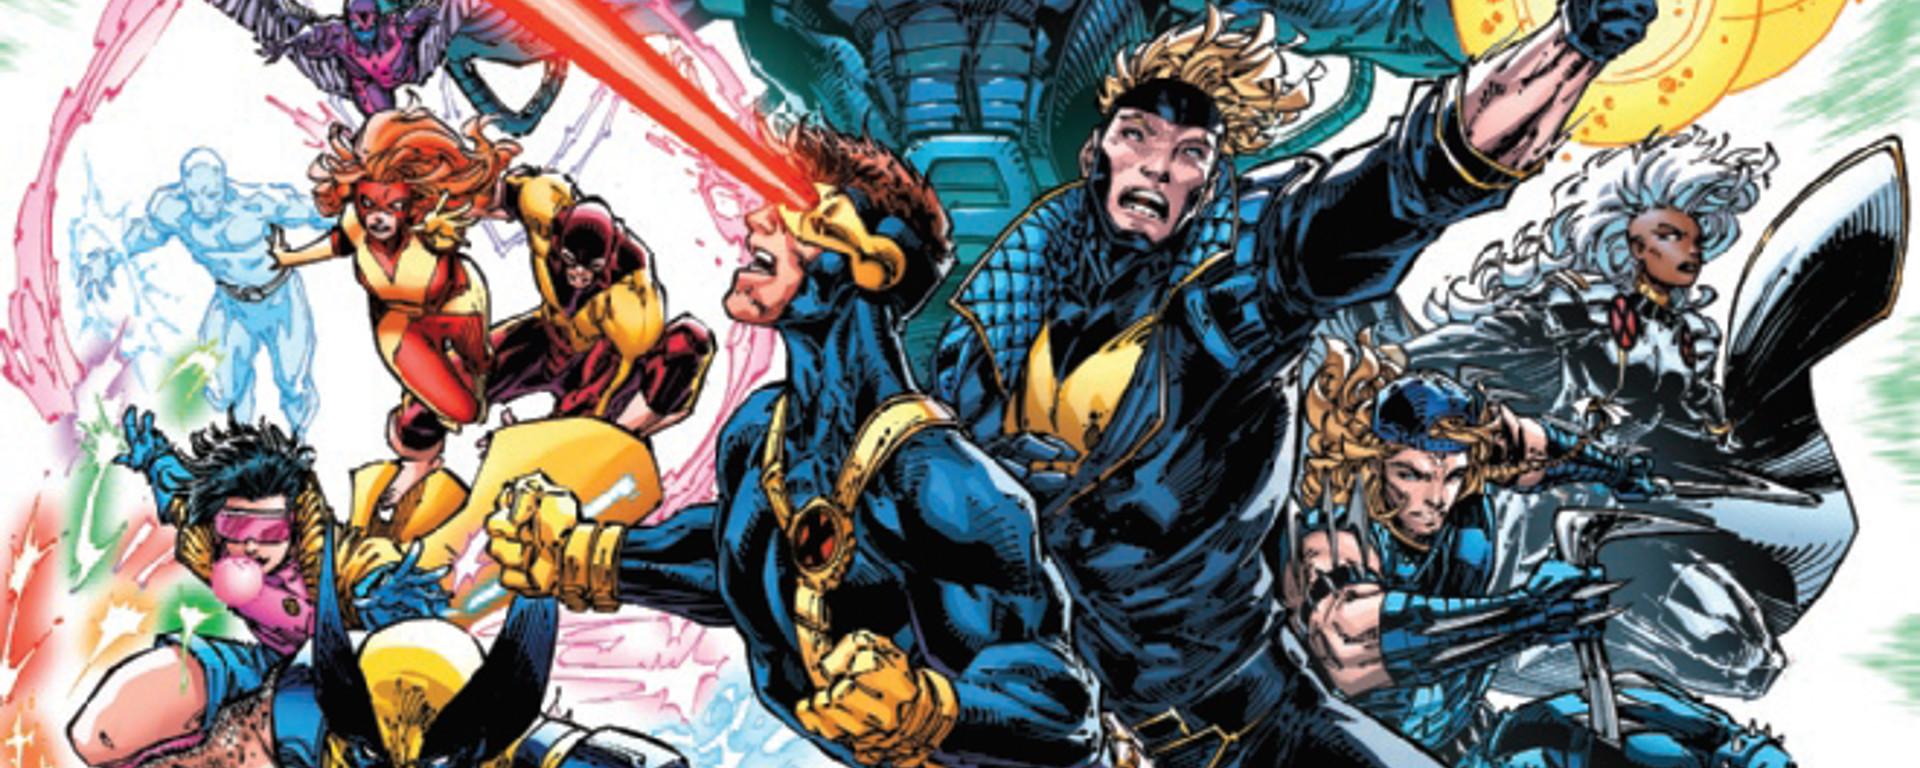 X-Men Legends #1 Header